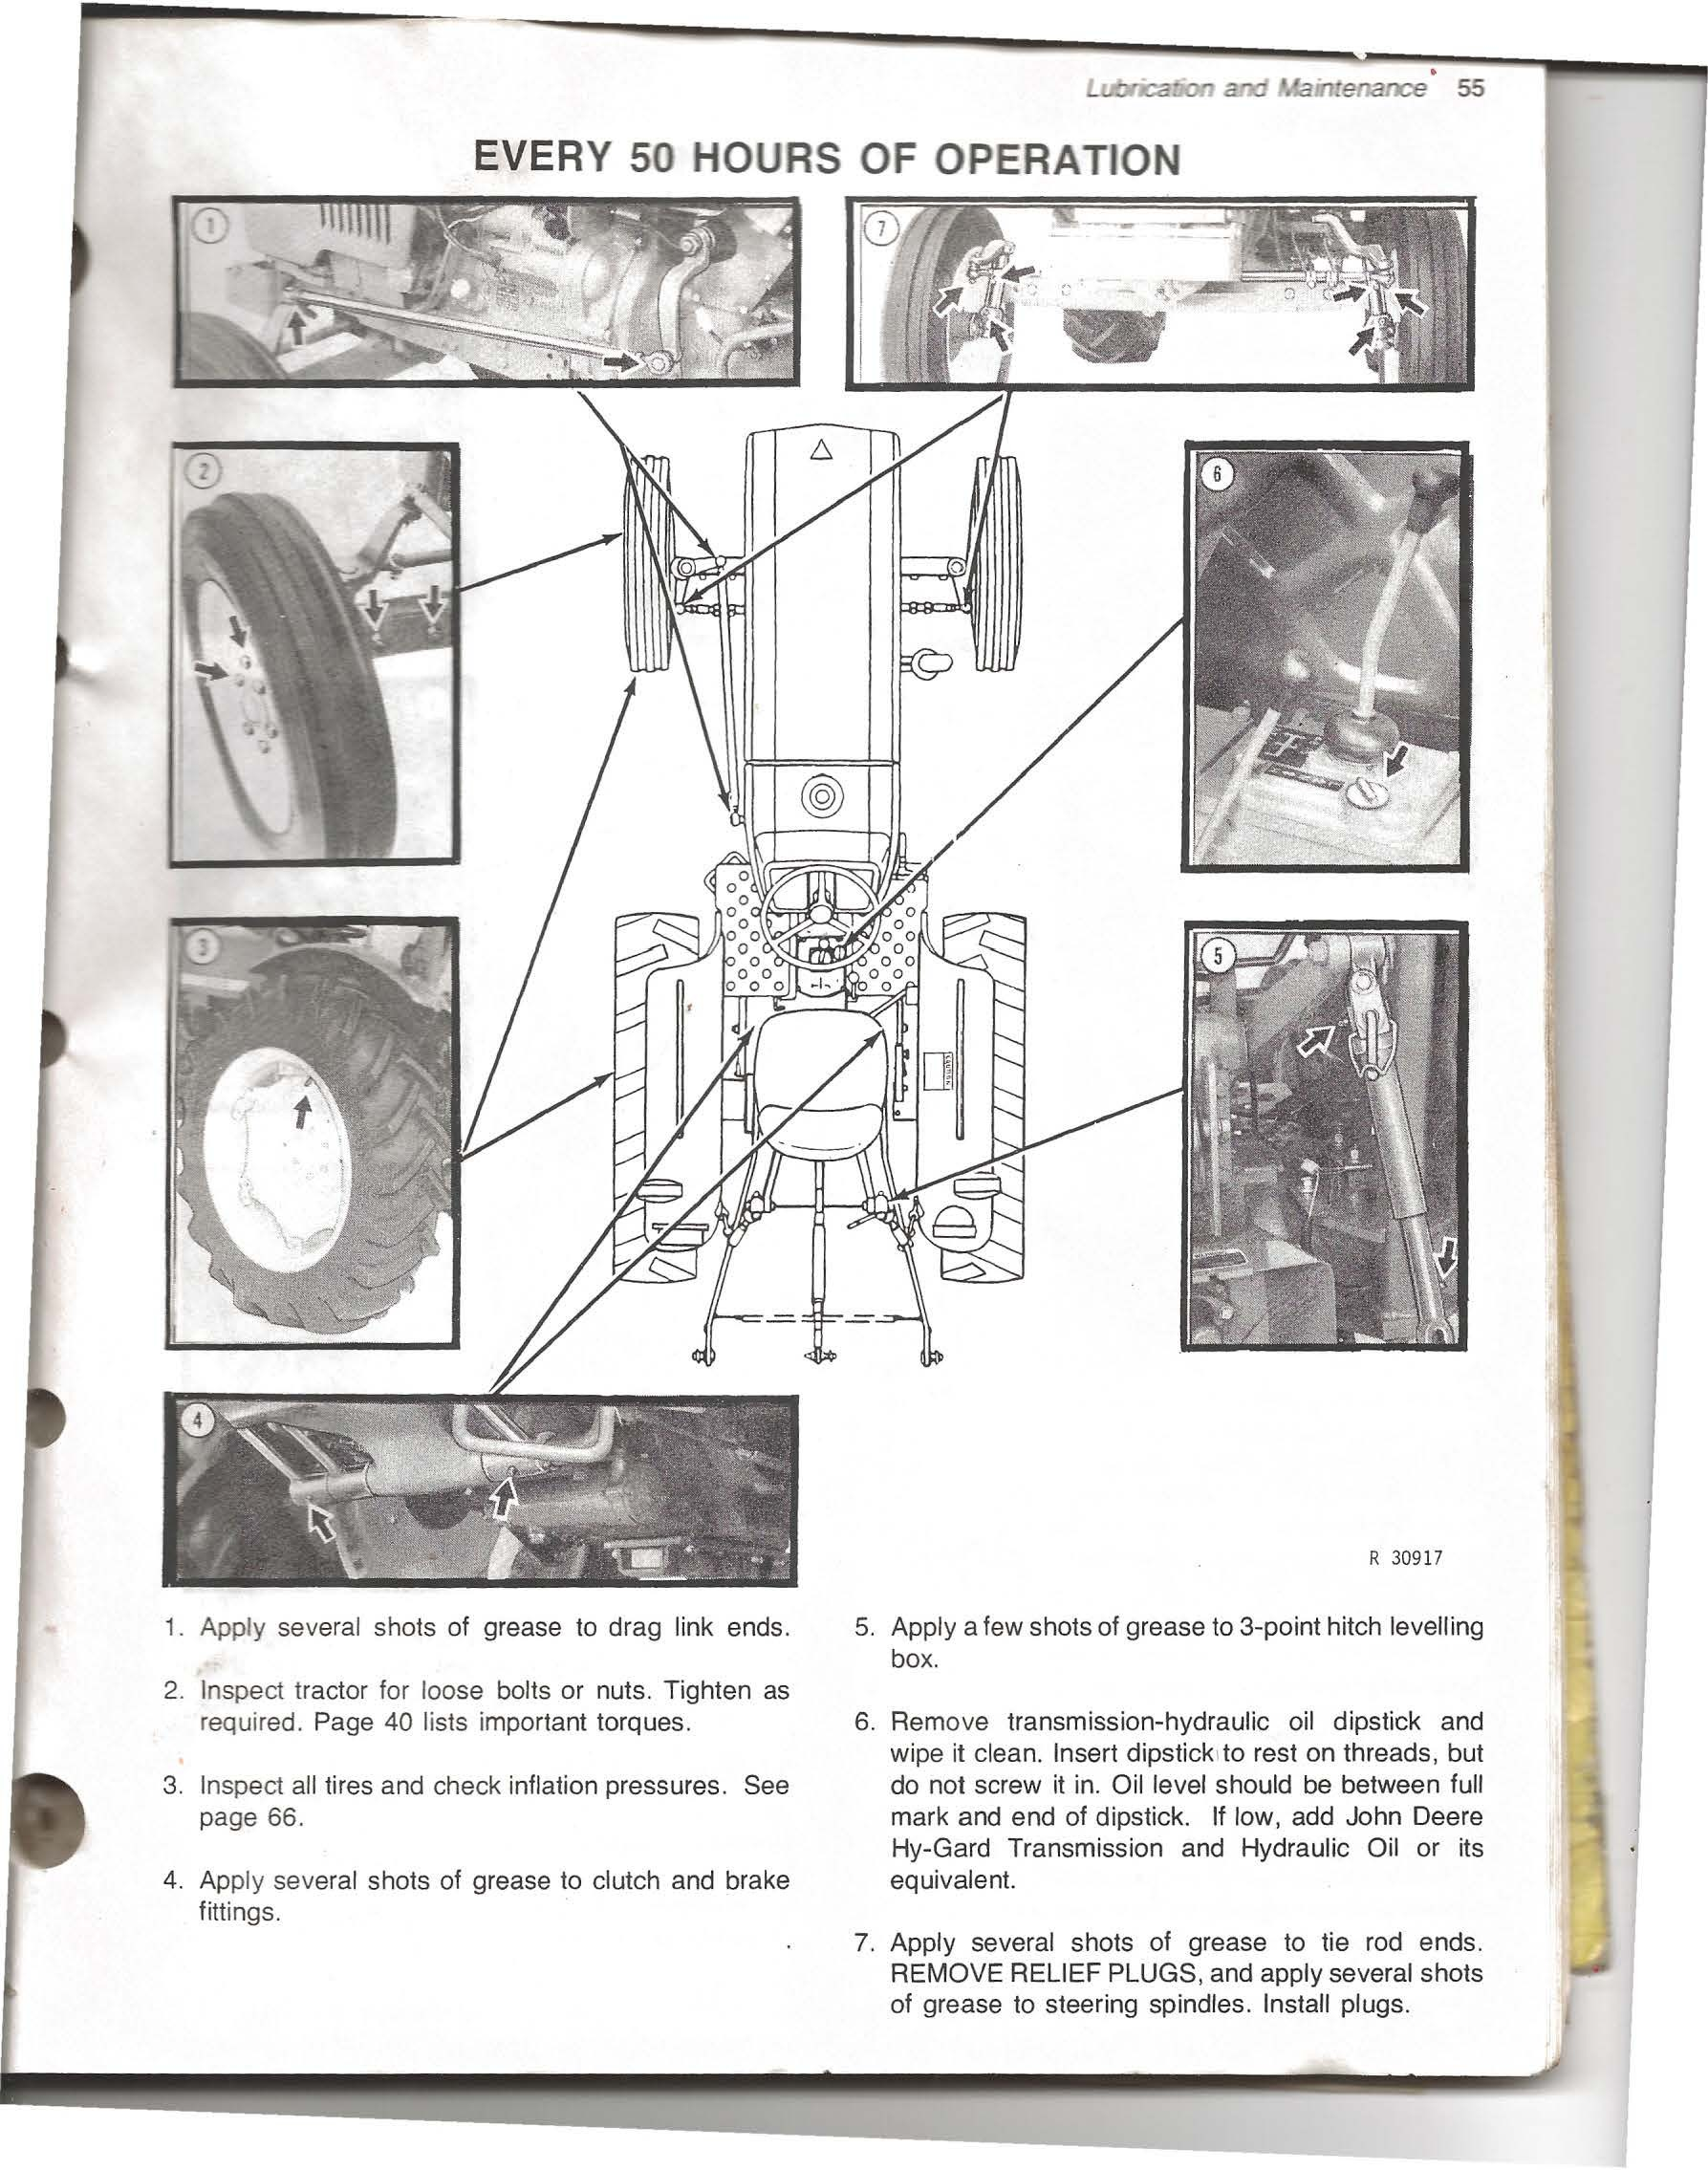 My John Deere 950 Operator's Manual - Poudre River Stables John Deere Tractor Wiring Diagram on john deere 950 parts diagram, john deere 950 tractor manual, ford 1710 tractor parts diagram, john deere voltage regulator wiring, john deere z225 wiring-diagram, john deere 1050 tractor wiring diagram, john deere 850 tractor wiring diagram, john deere 6400 tractor wiring diagram, john deere 750 tractor wiring diagram, john deere 950 tractor engine, john deere lx172 wiring-diagram, john deere 820 tractor wiring diagram, john deere 6200 tractor manual, john deere b tractor wiring diagram, john deere 870 tractor parts, john deere 4300 tractor wiring diagram, david brown 950 tractor wiring diagram, john deere tractor engine diagrams, john deere lt155 wiring-diagram, john deere m wiring-diagram,